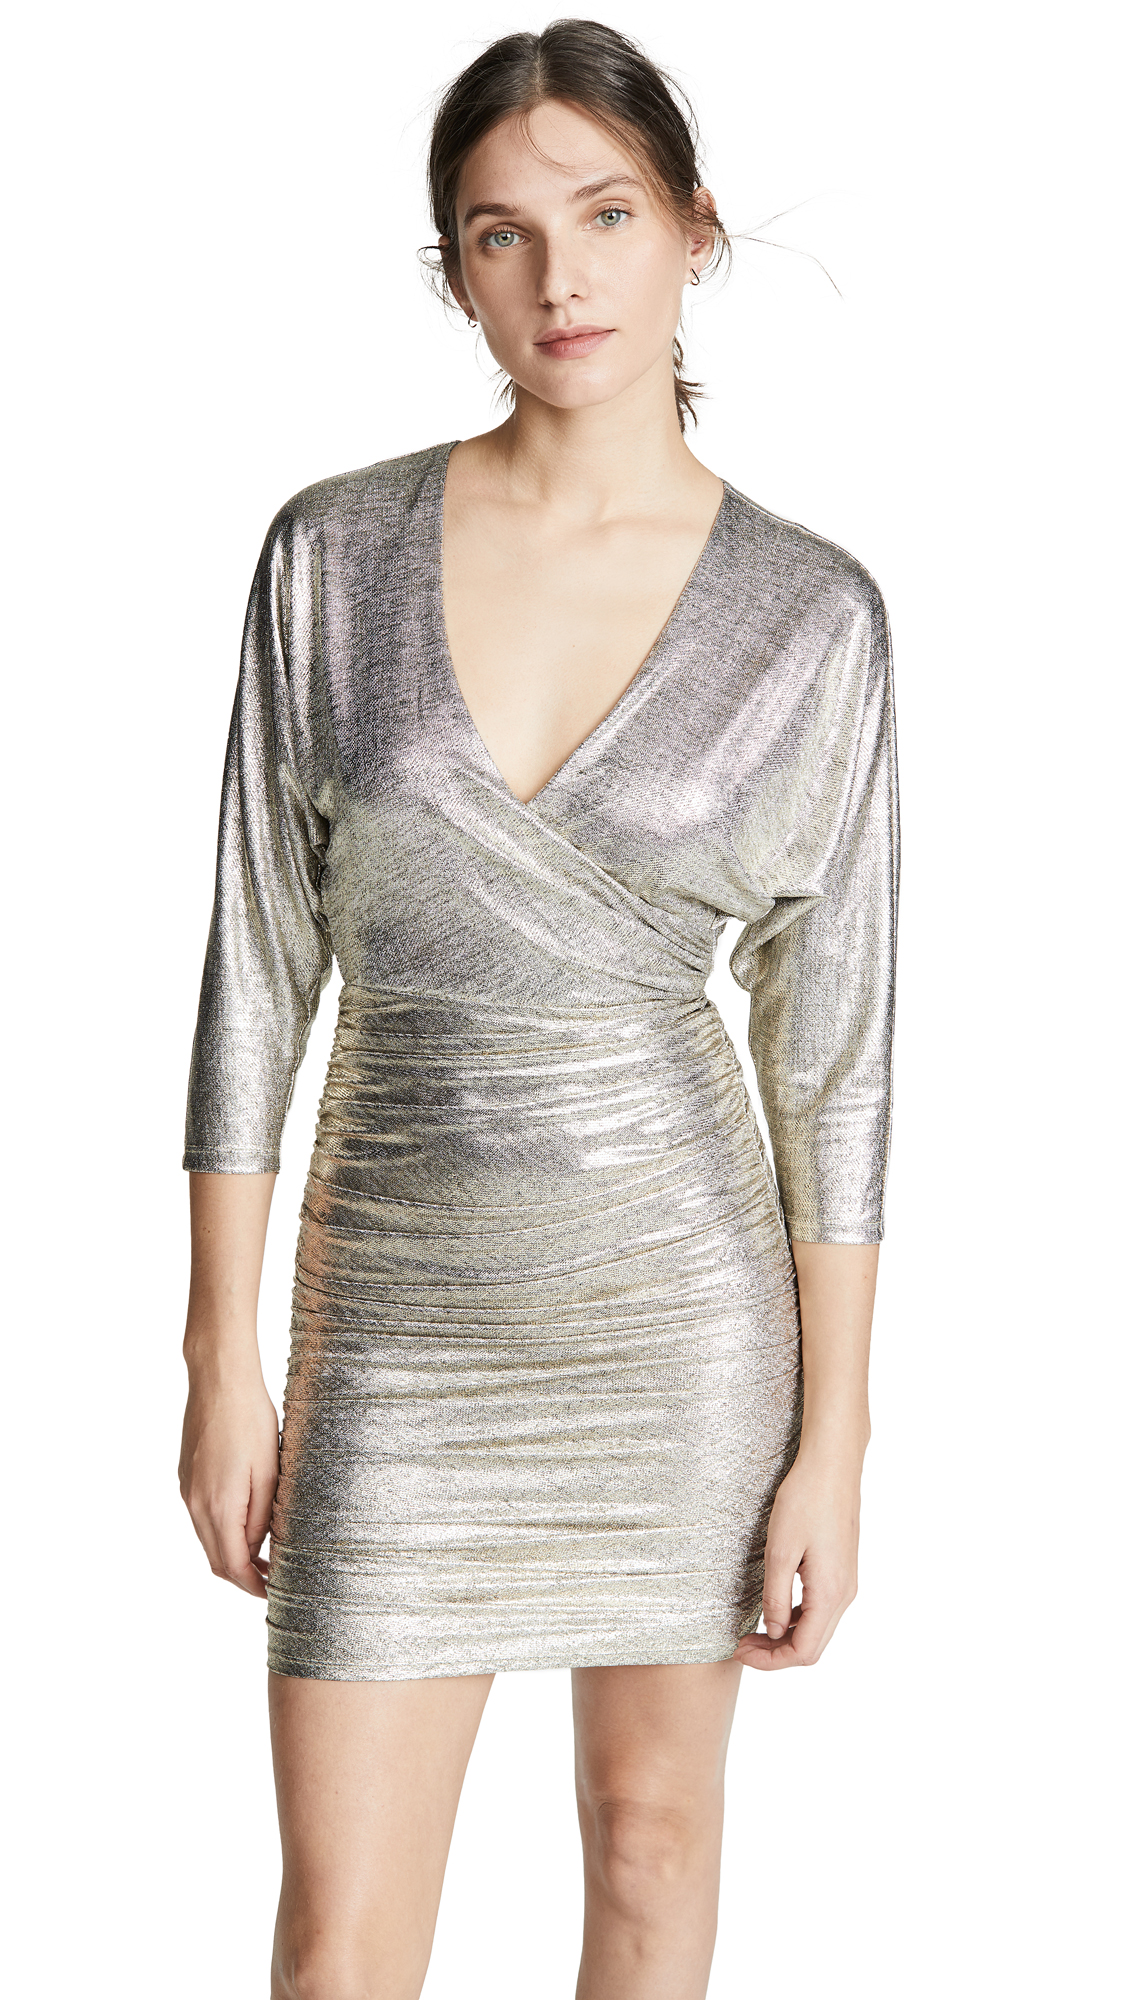 alice + olivia Pace Bat Wing Sleeve Drapey Dress - Silver